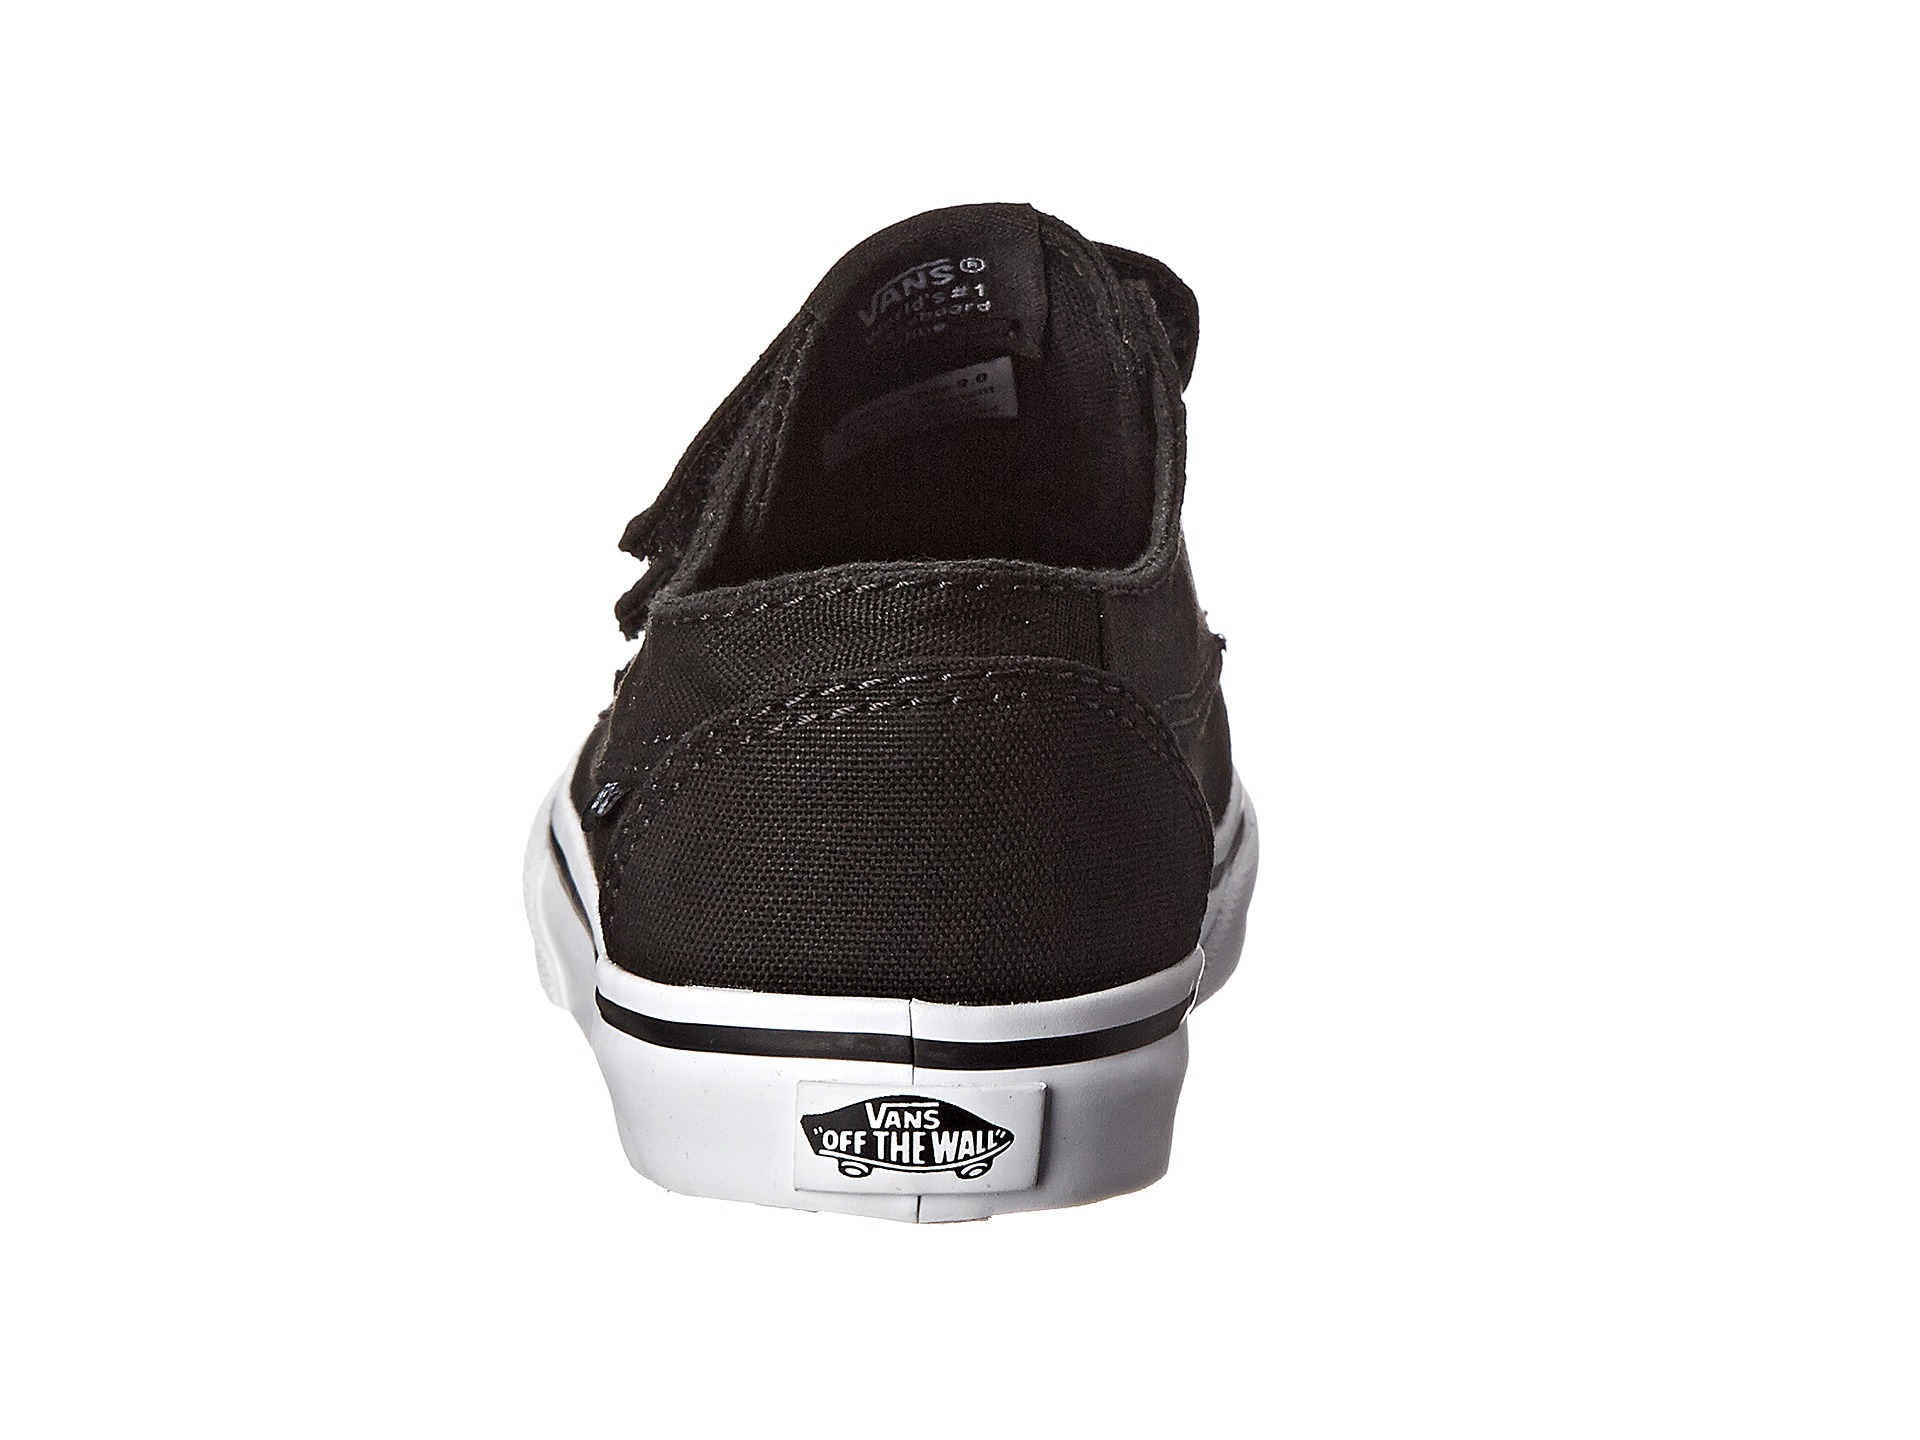 Zappos Vans Boat Shoes